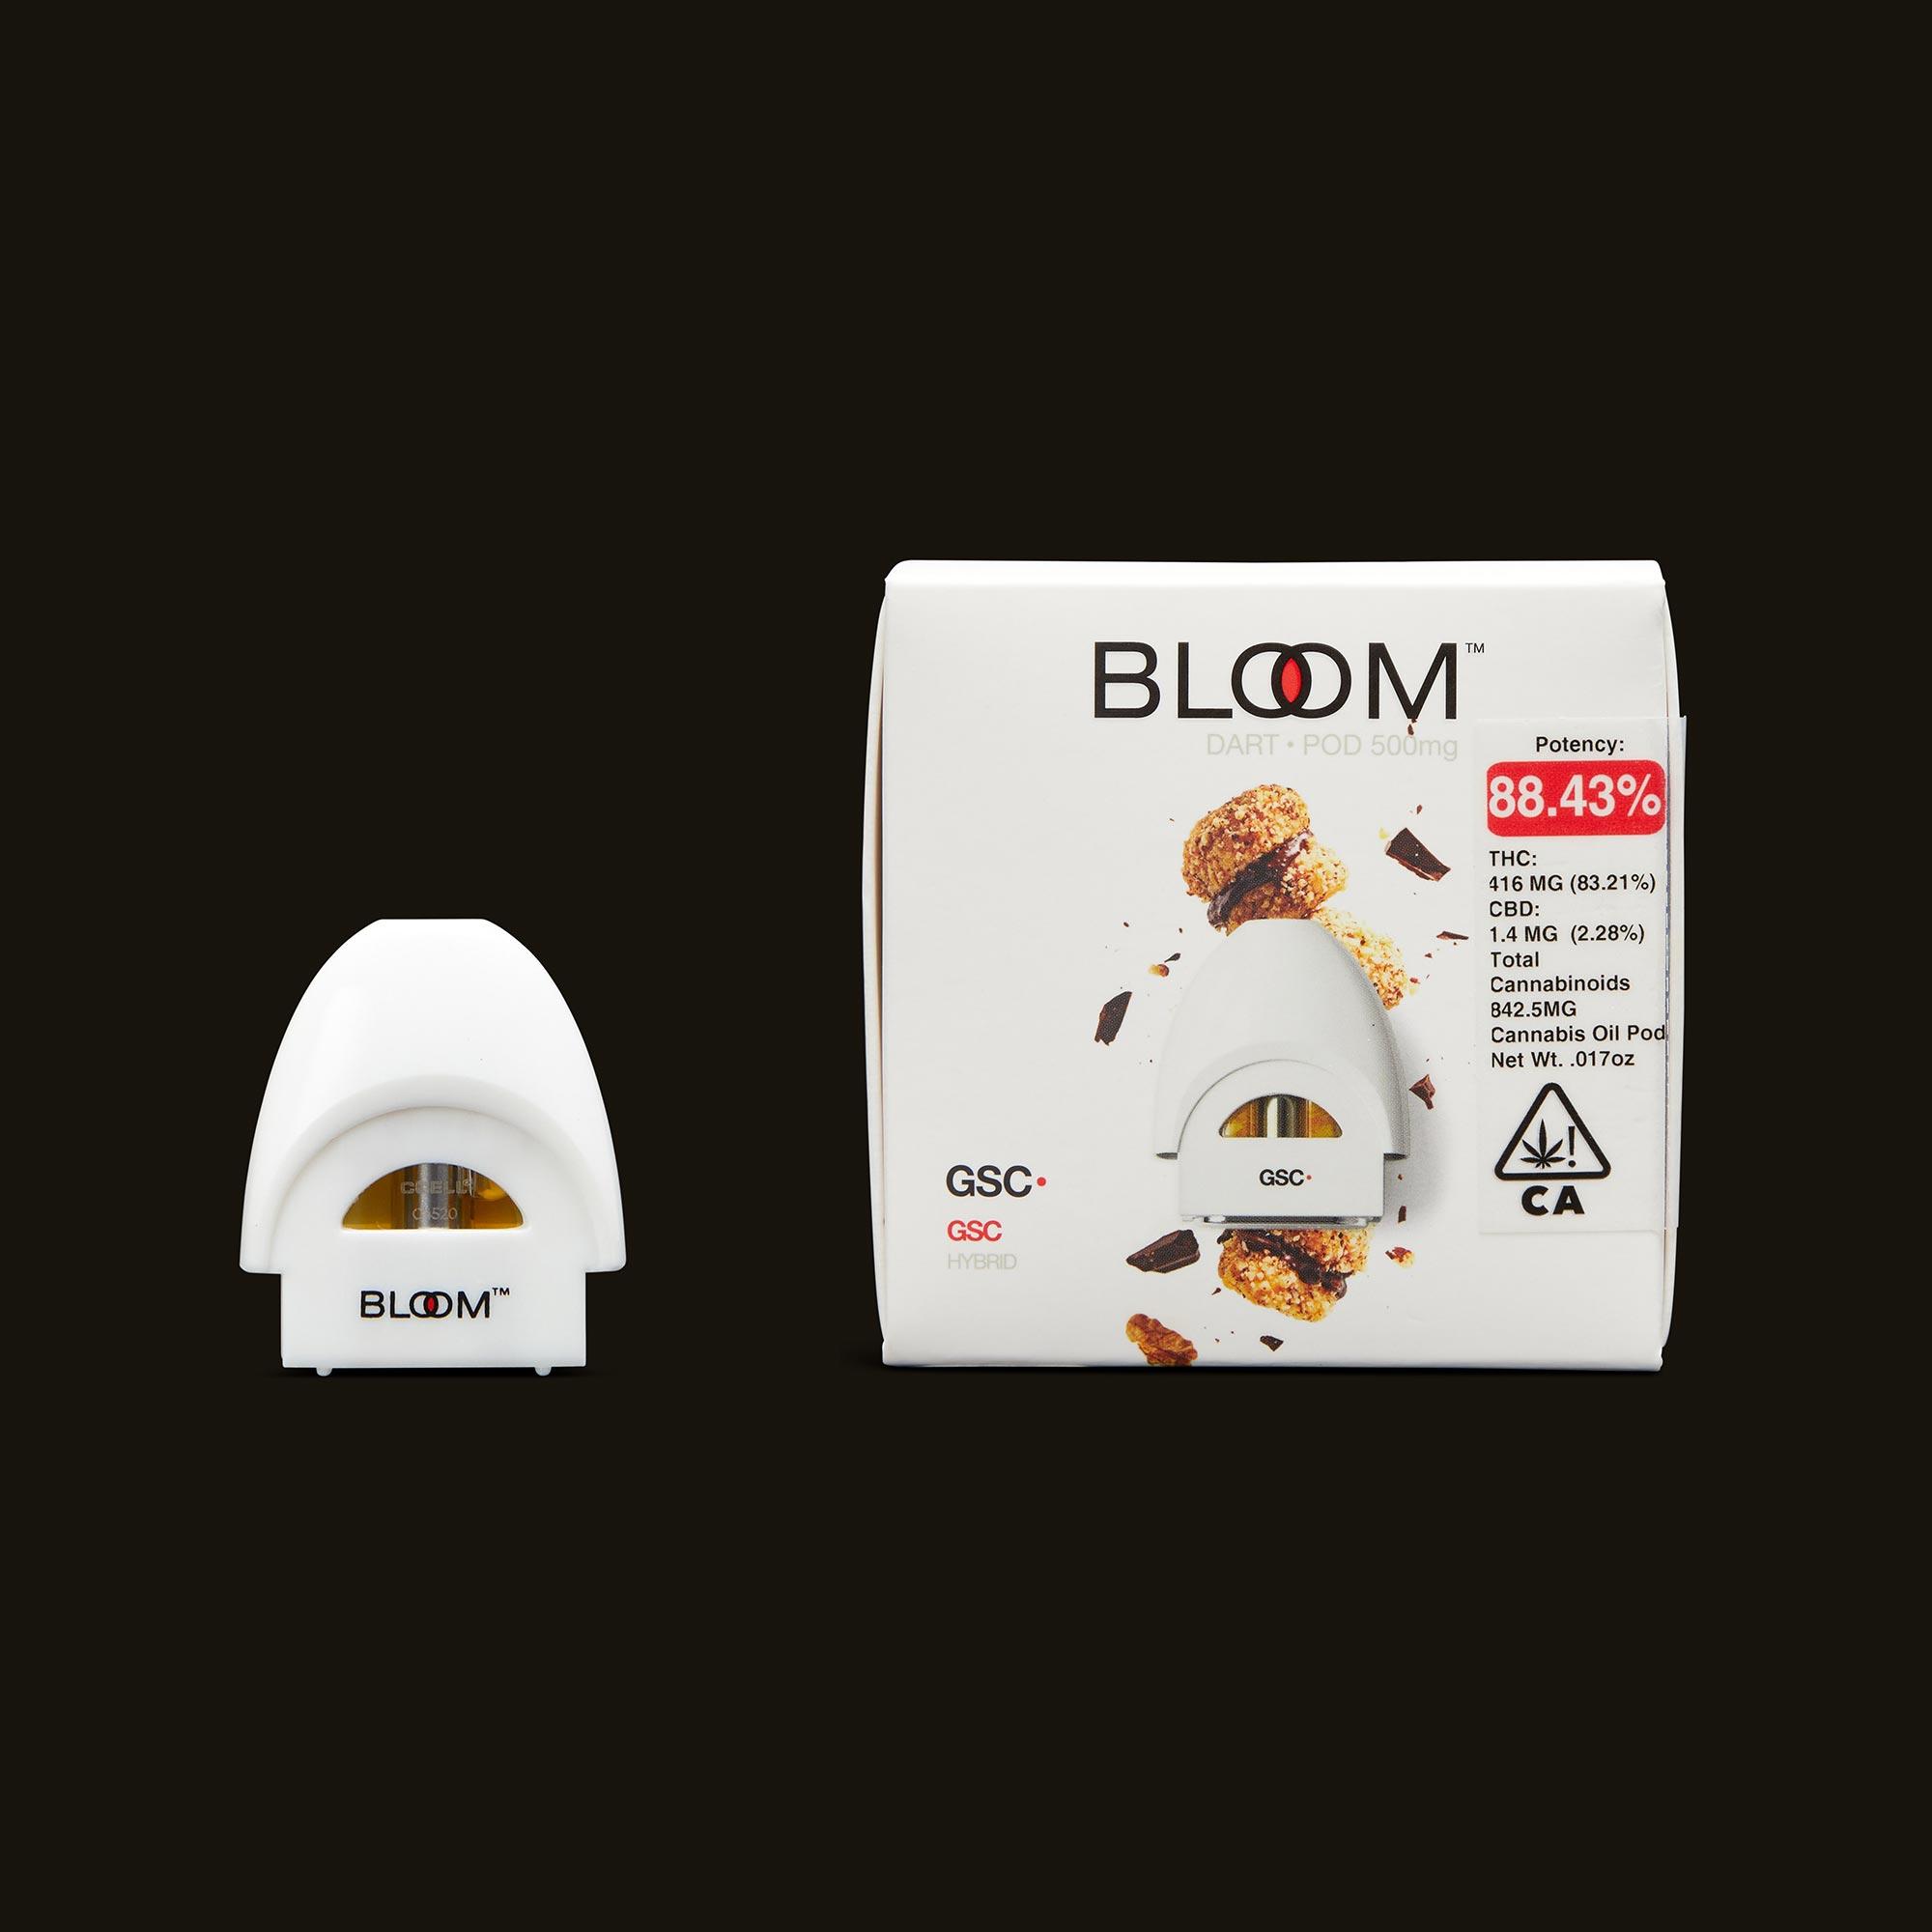 GSC Dart Pod by Bloom Brands